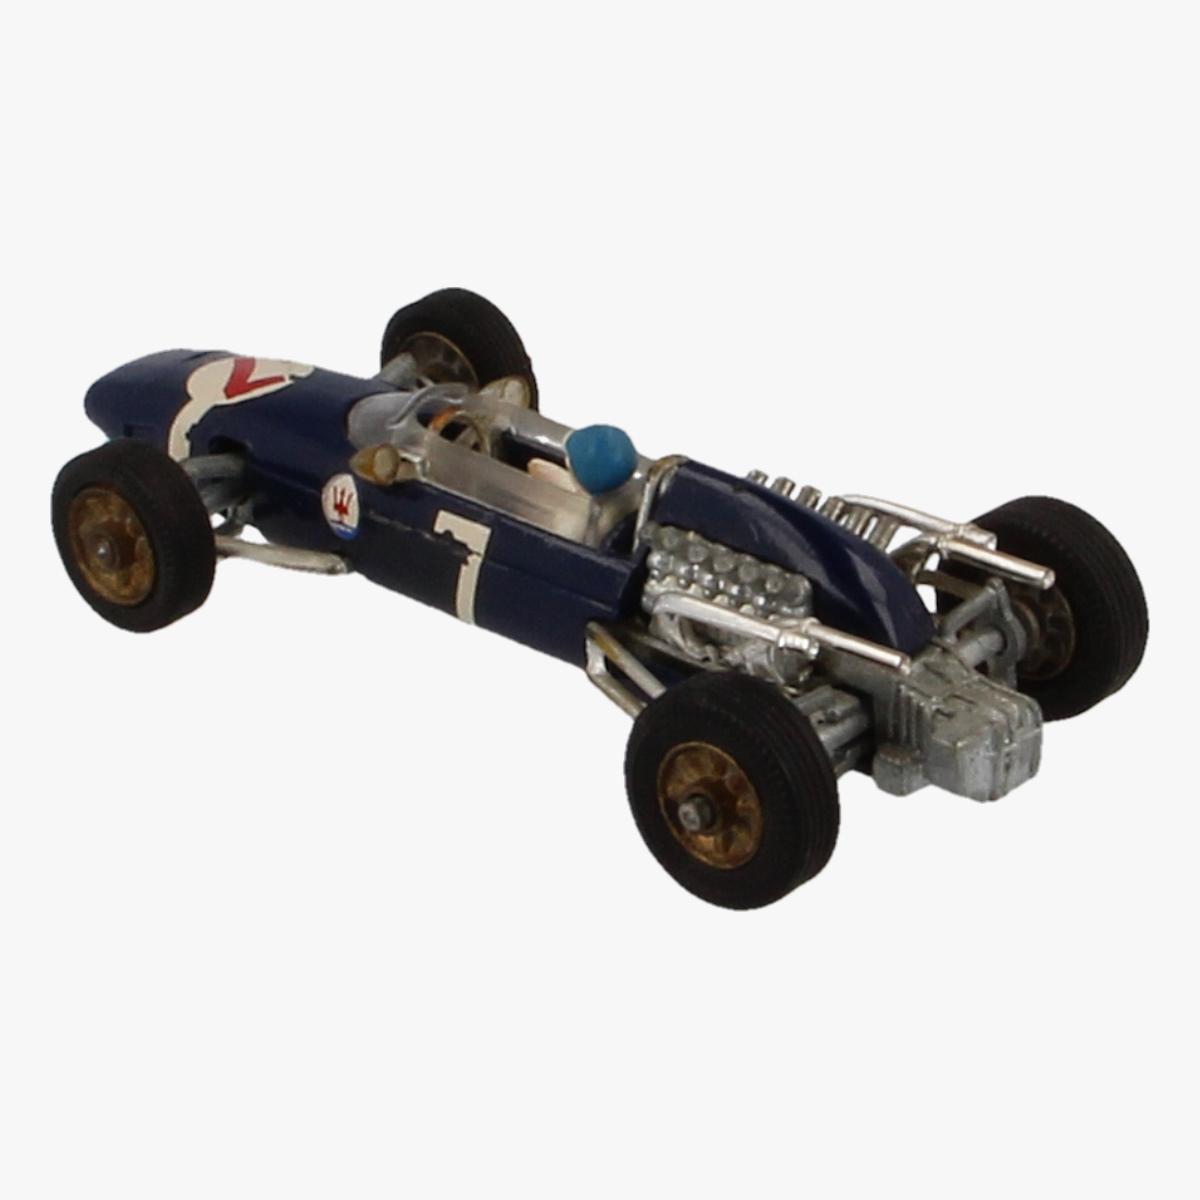 Afbeeldingen van Corgi Toys. Cooper Maserati F/1 156